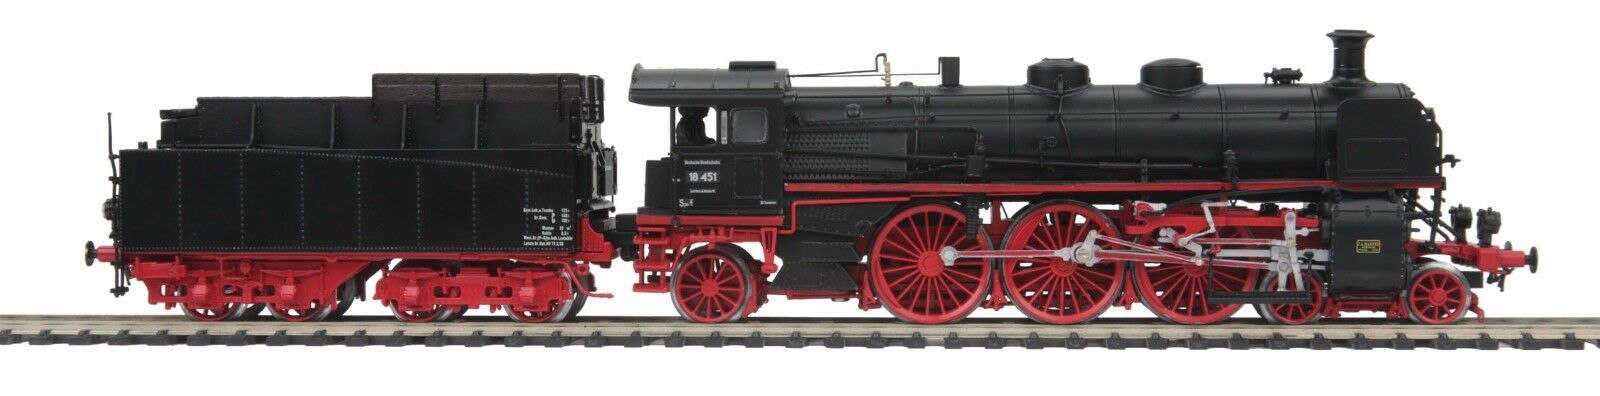 MTH 80-3217-5, clase 18.4 Locomotora de vapor con proto-Sound 3E Deutsche Bundesbahn